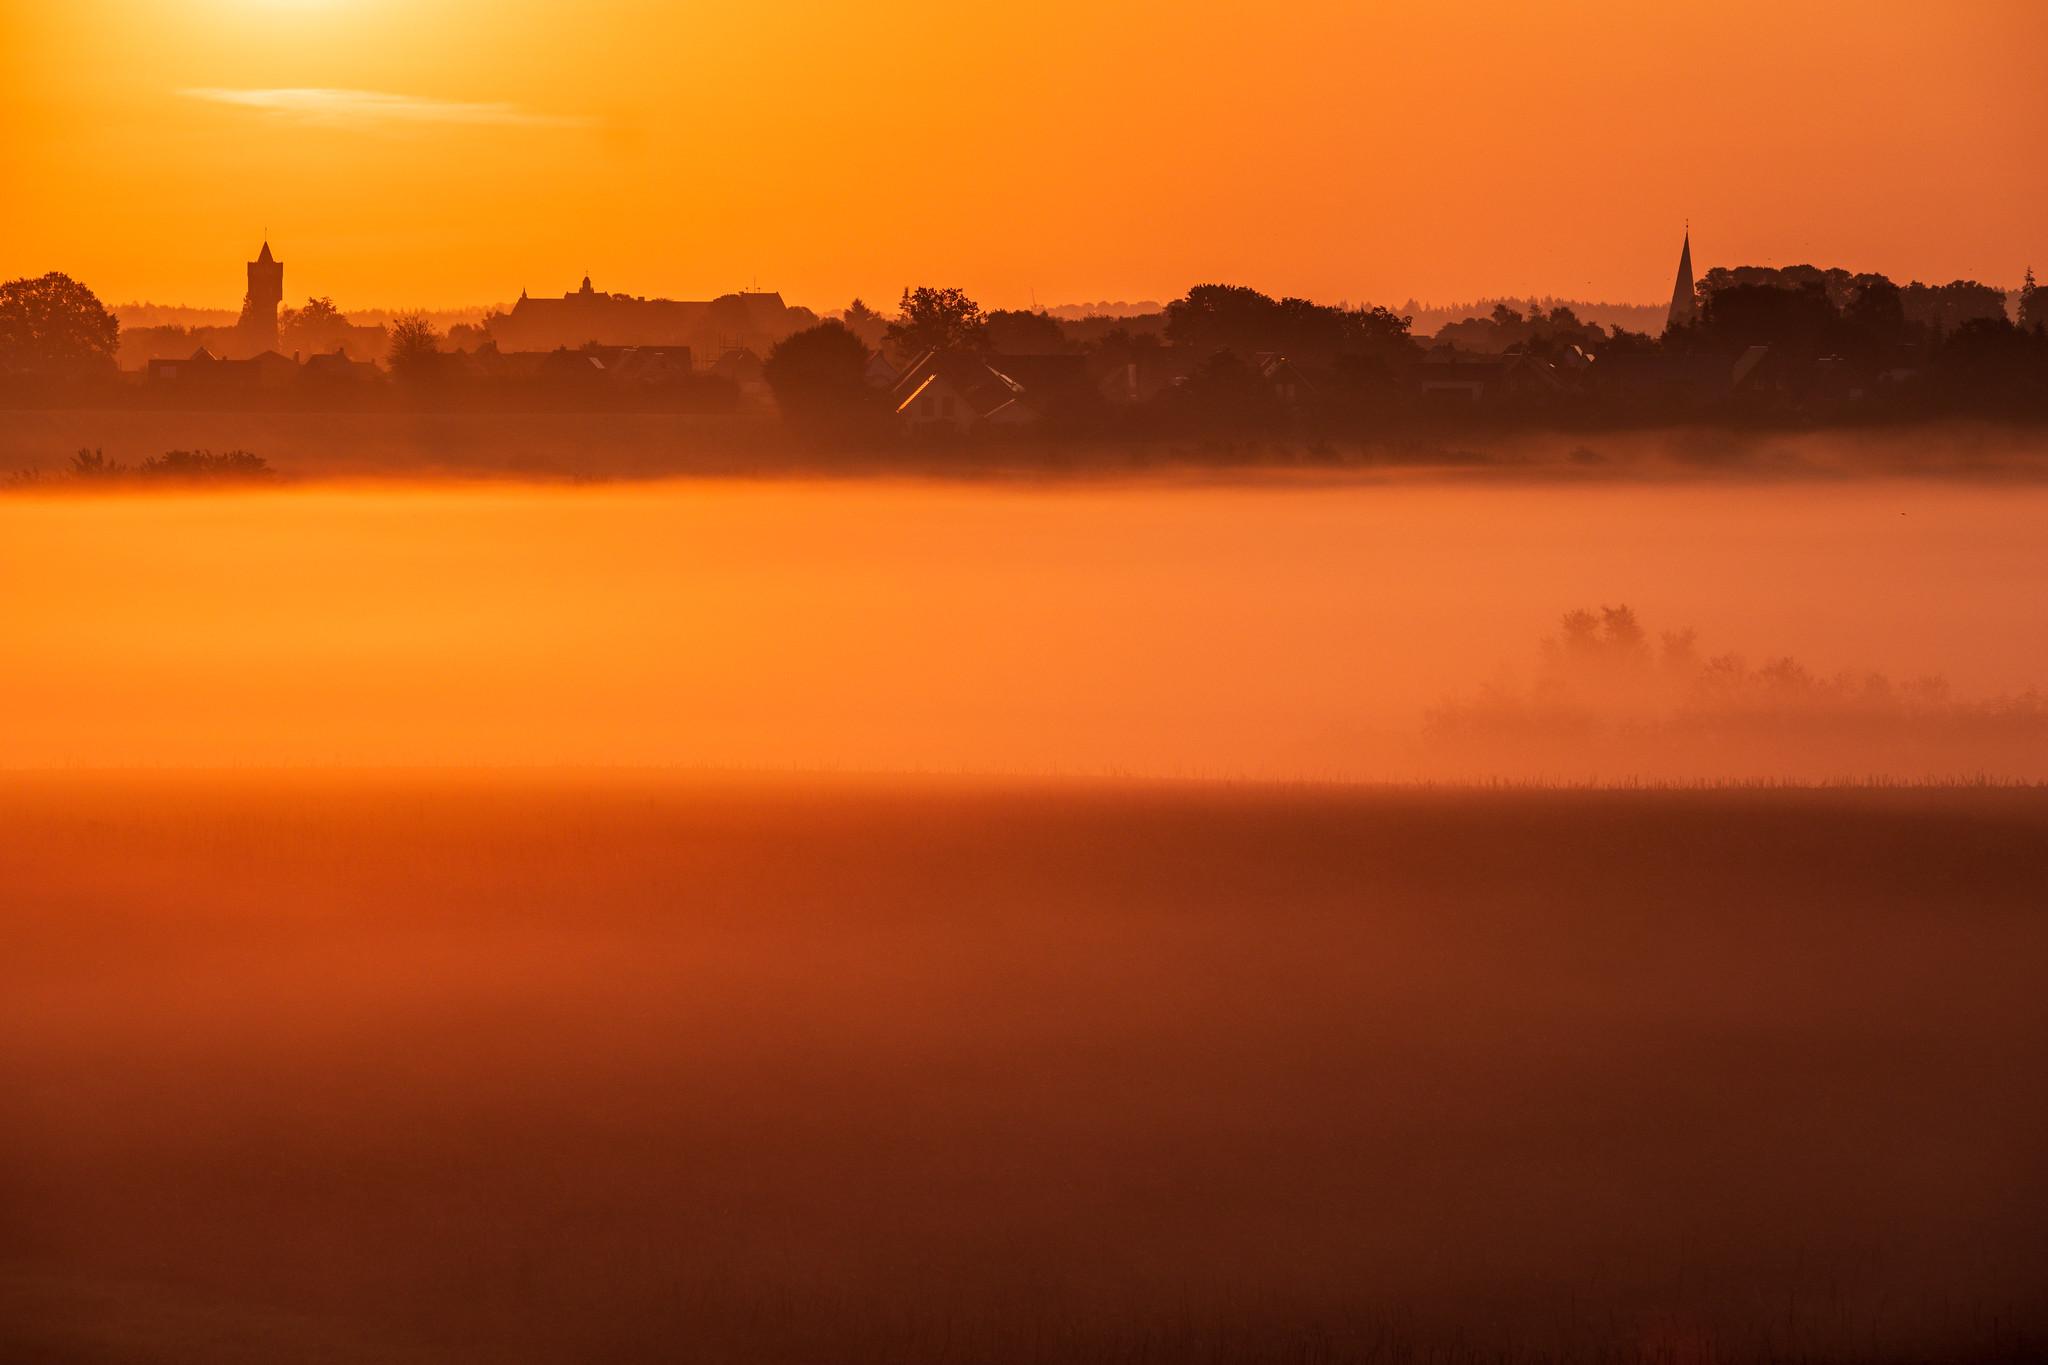 Sonnenaufgang über Eutin, Ostholstein